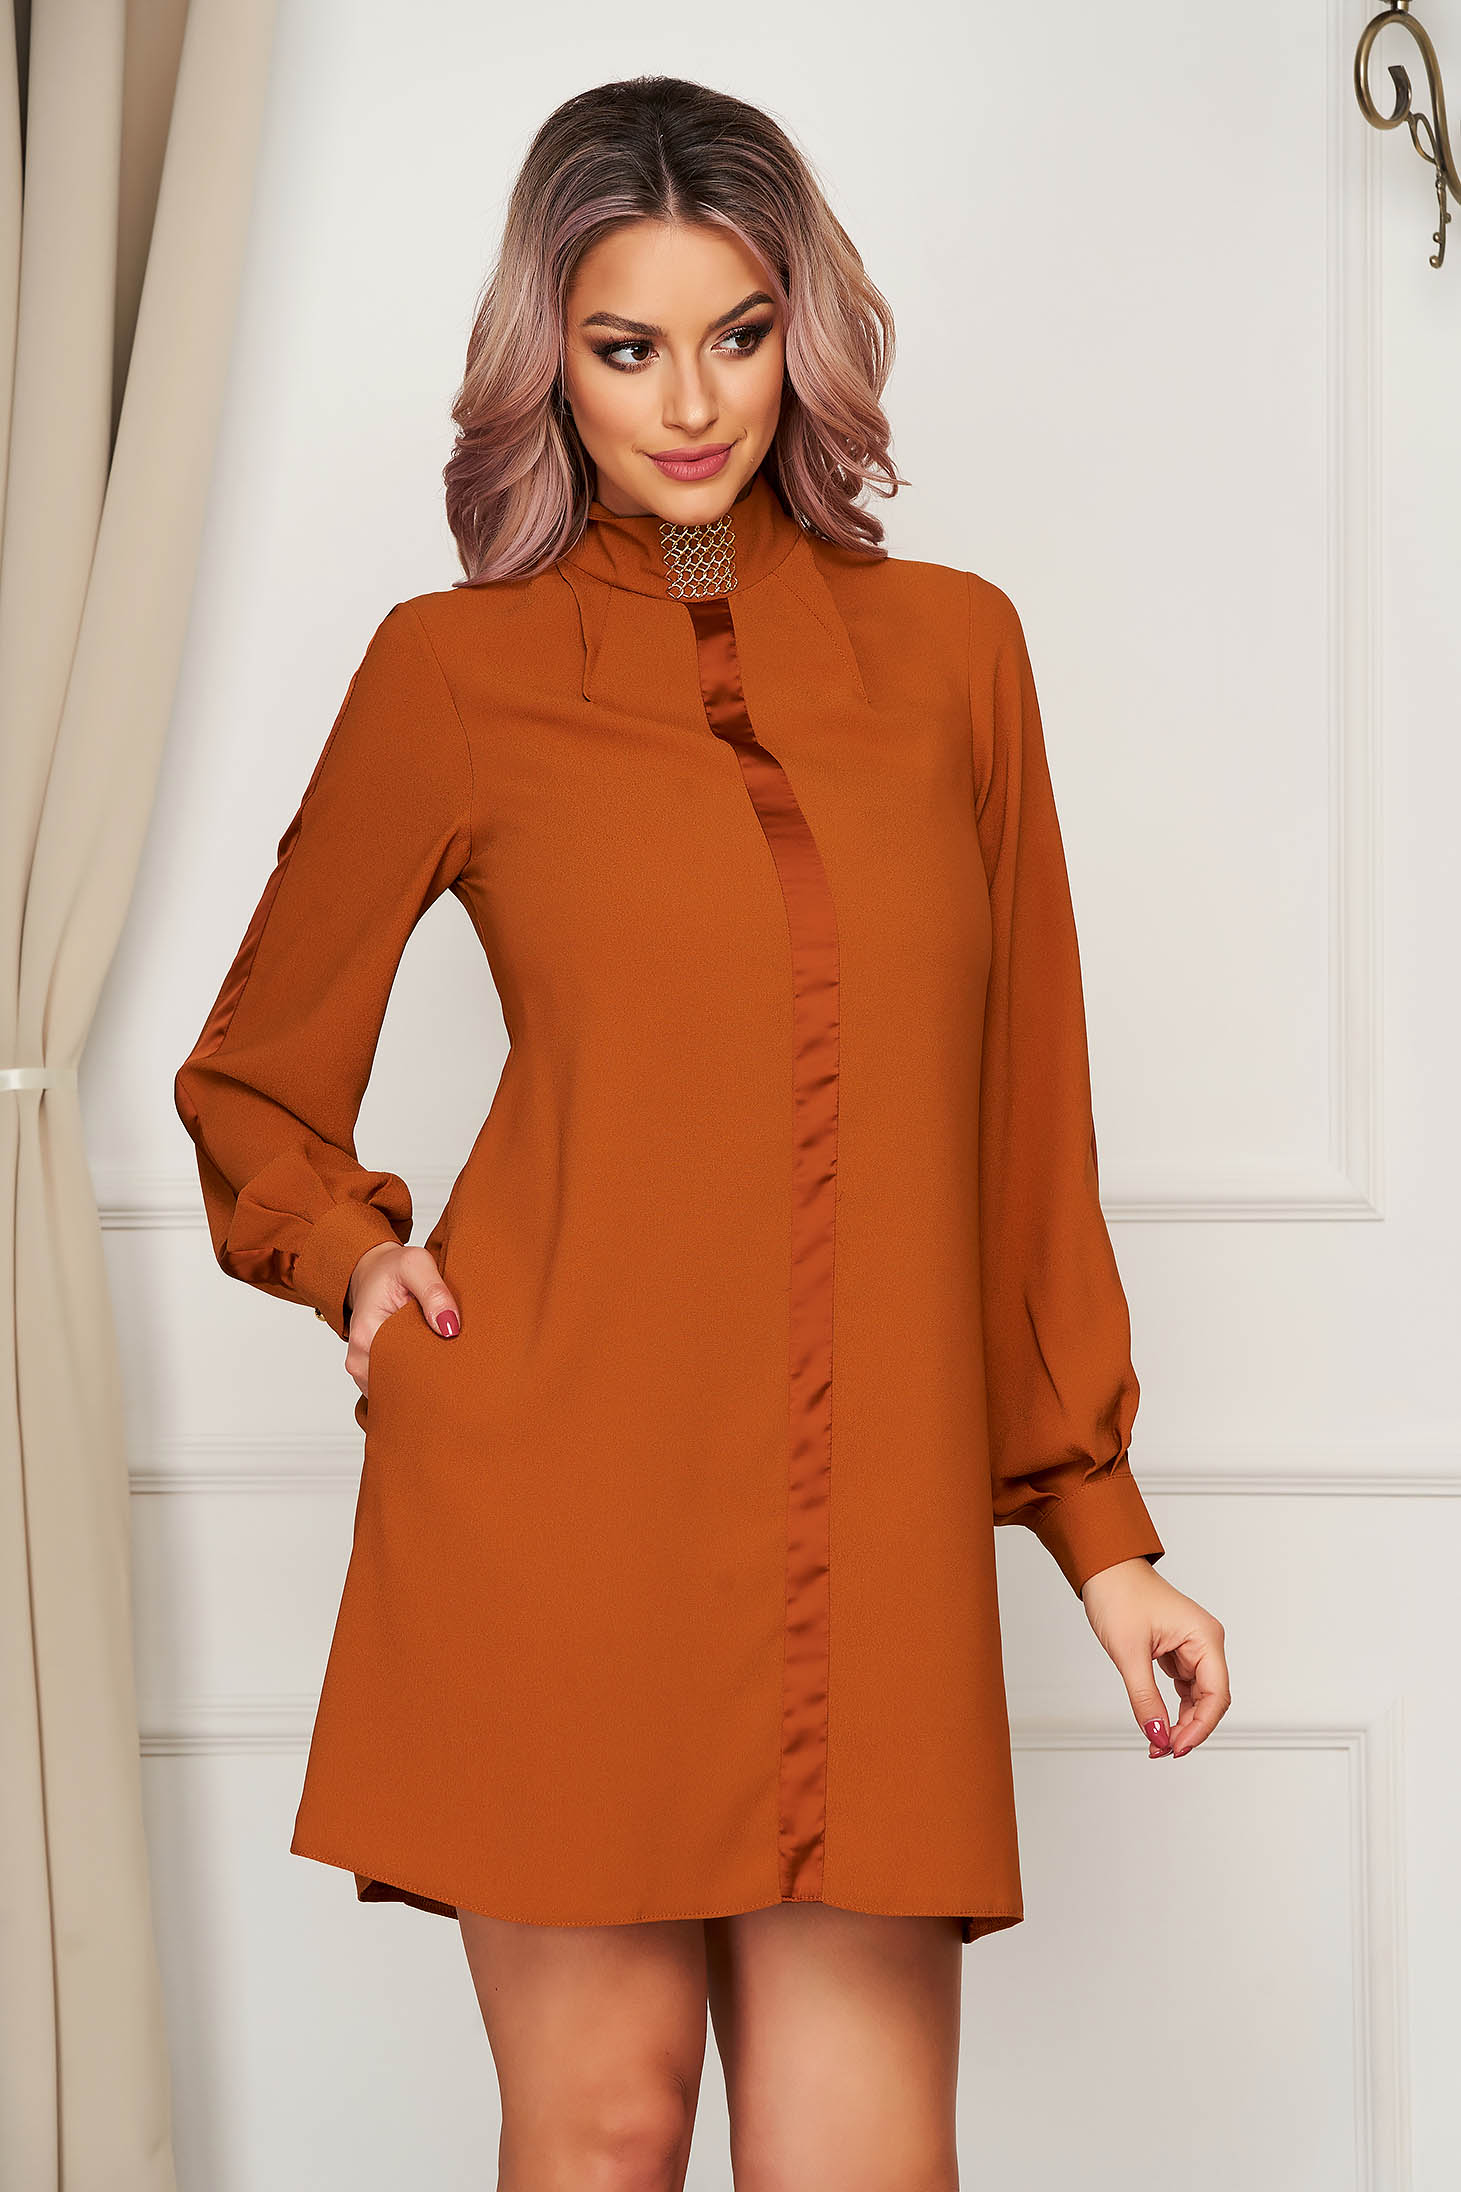 Short cut daily mustard dress from veil fabric a-line turtleneck long sleeved